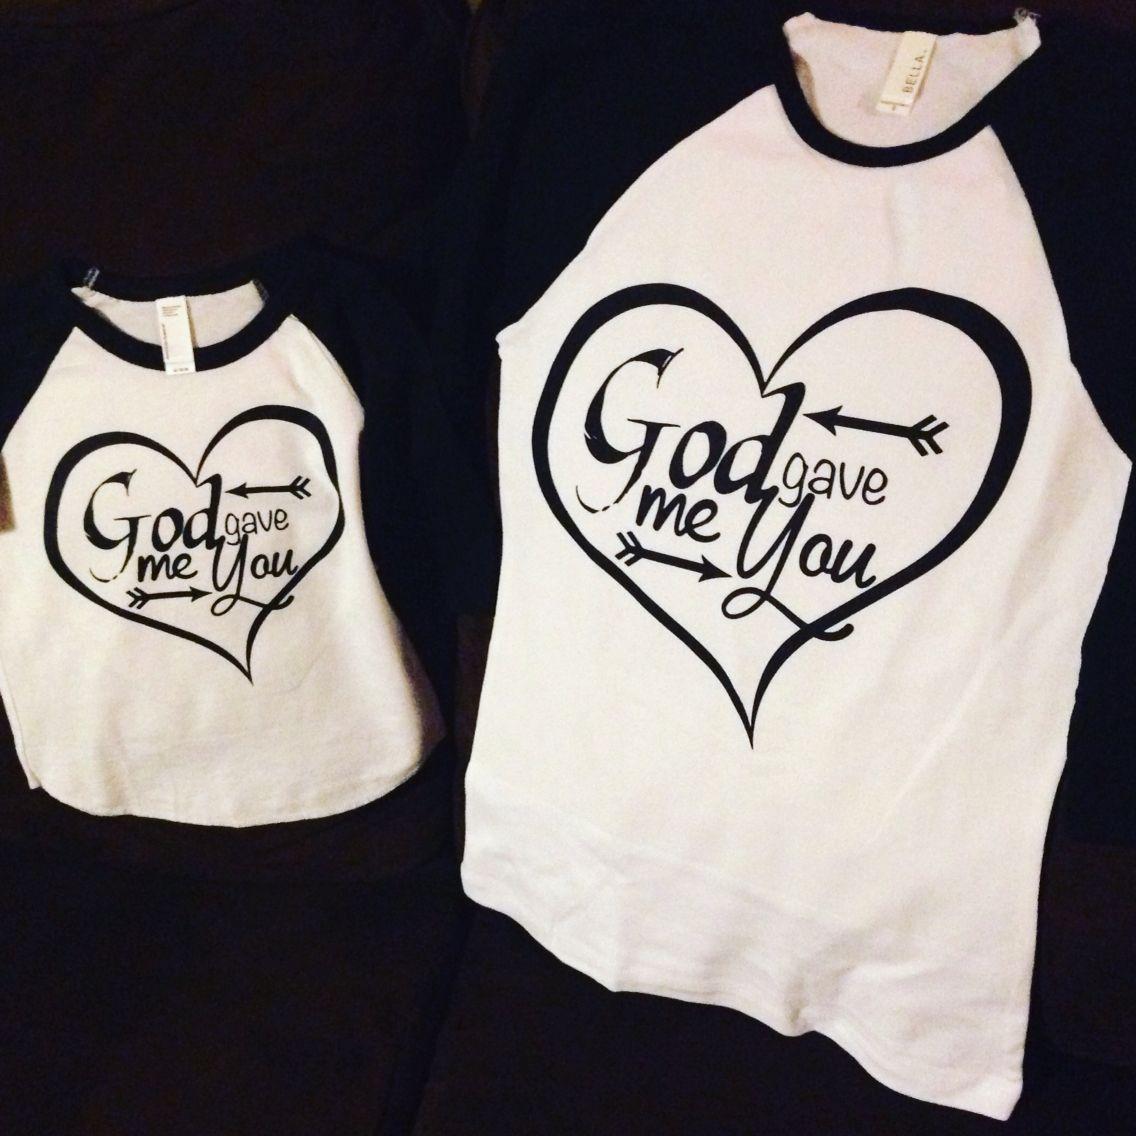 God Gave me you mommy and me baseball tshirts. #DIY #funtshirts Send a DM on instagram @memergie